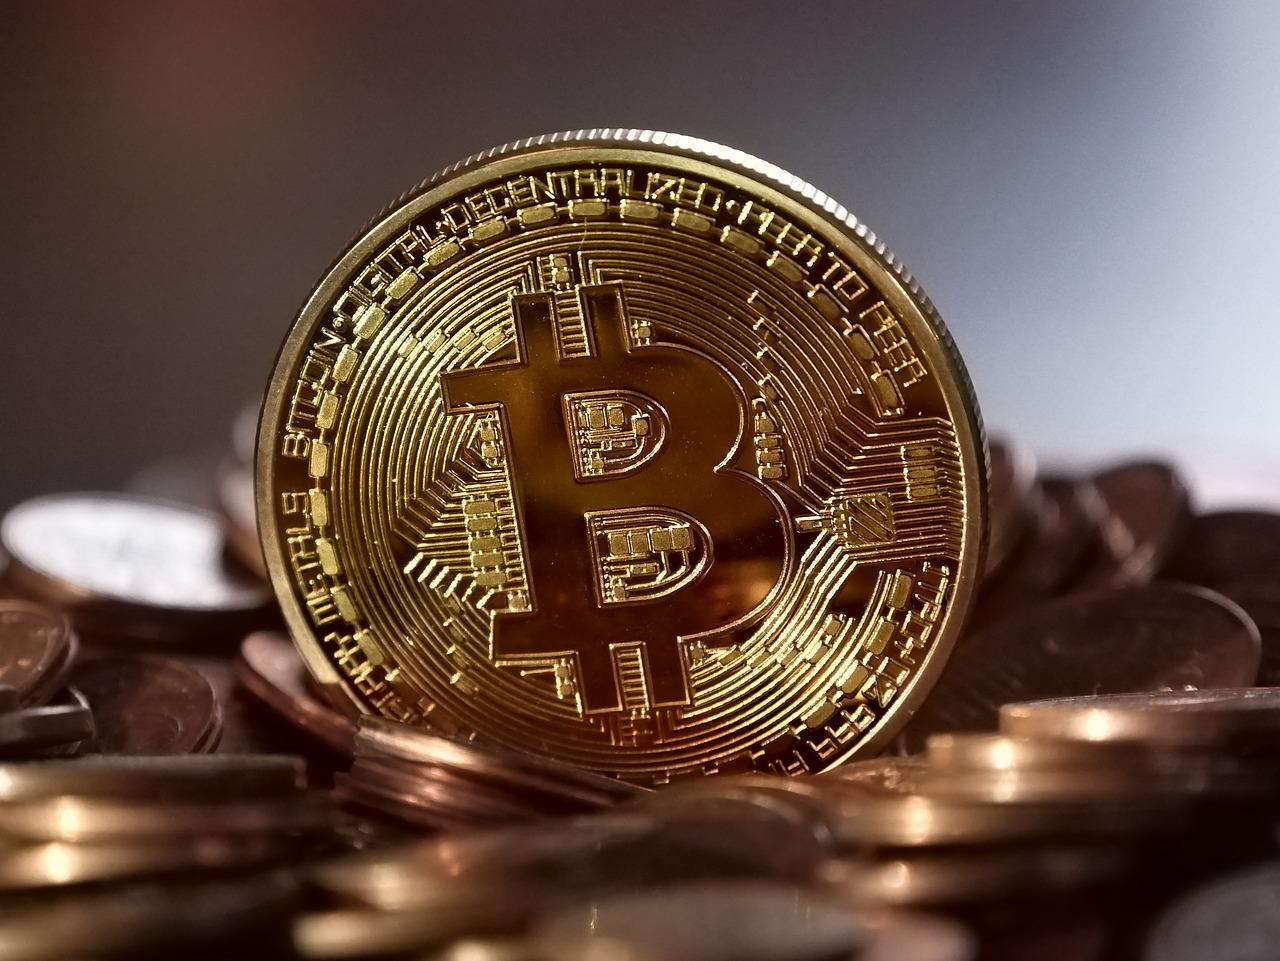 Tor・仮想通貨の匿名性は破られたのか。2019年モナコイン流出事件の真相を徹底解説!どうしてTorで身元特定!?